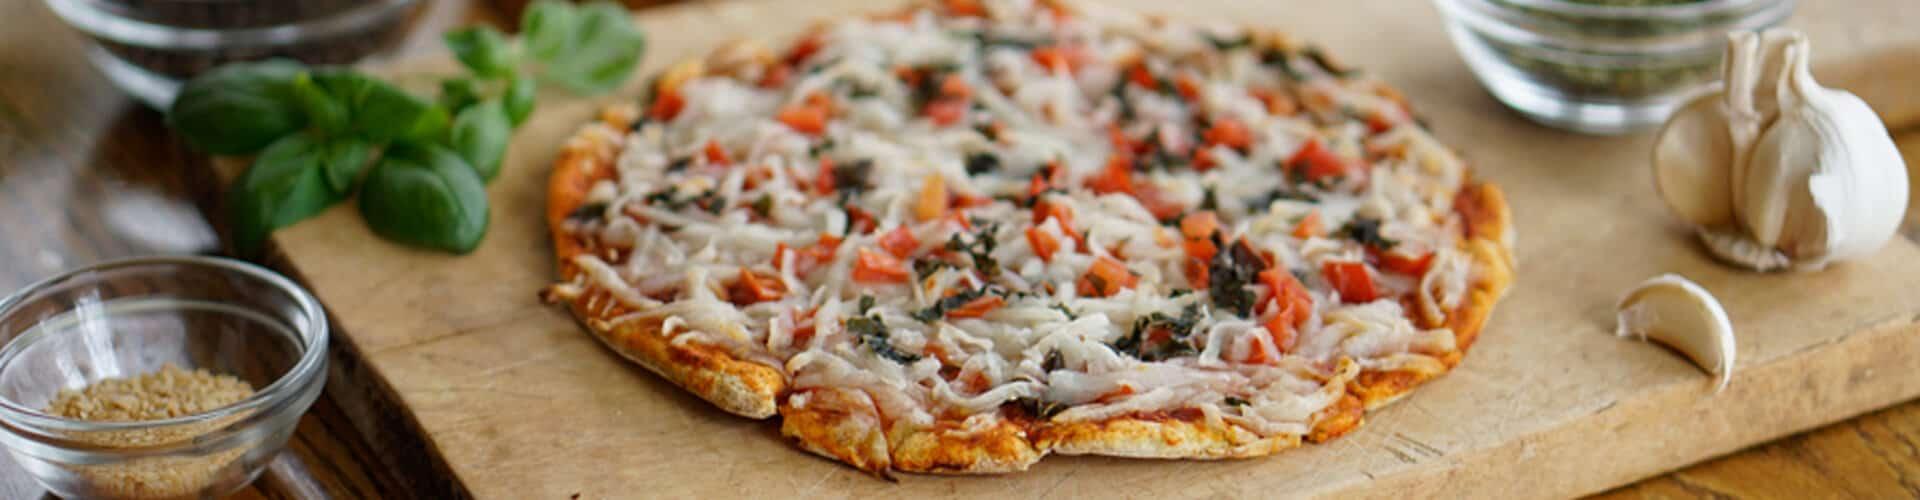 Chloe's Pizza